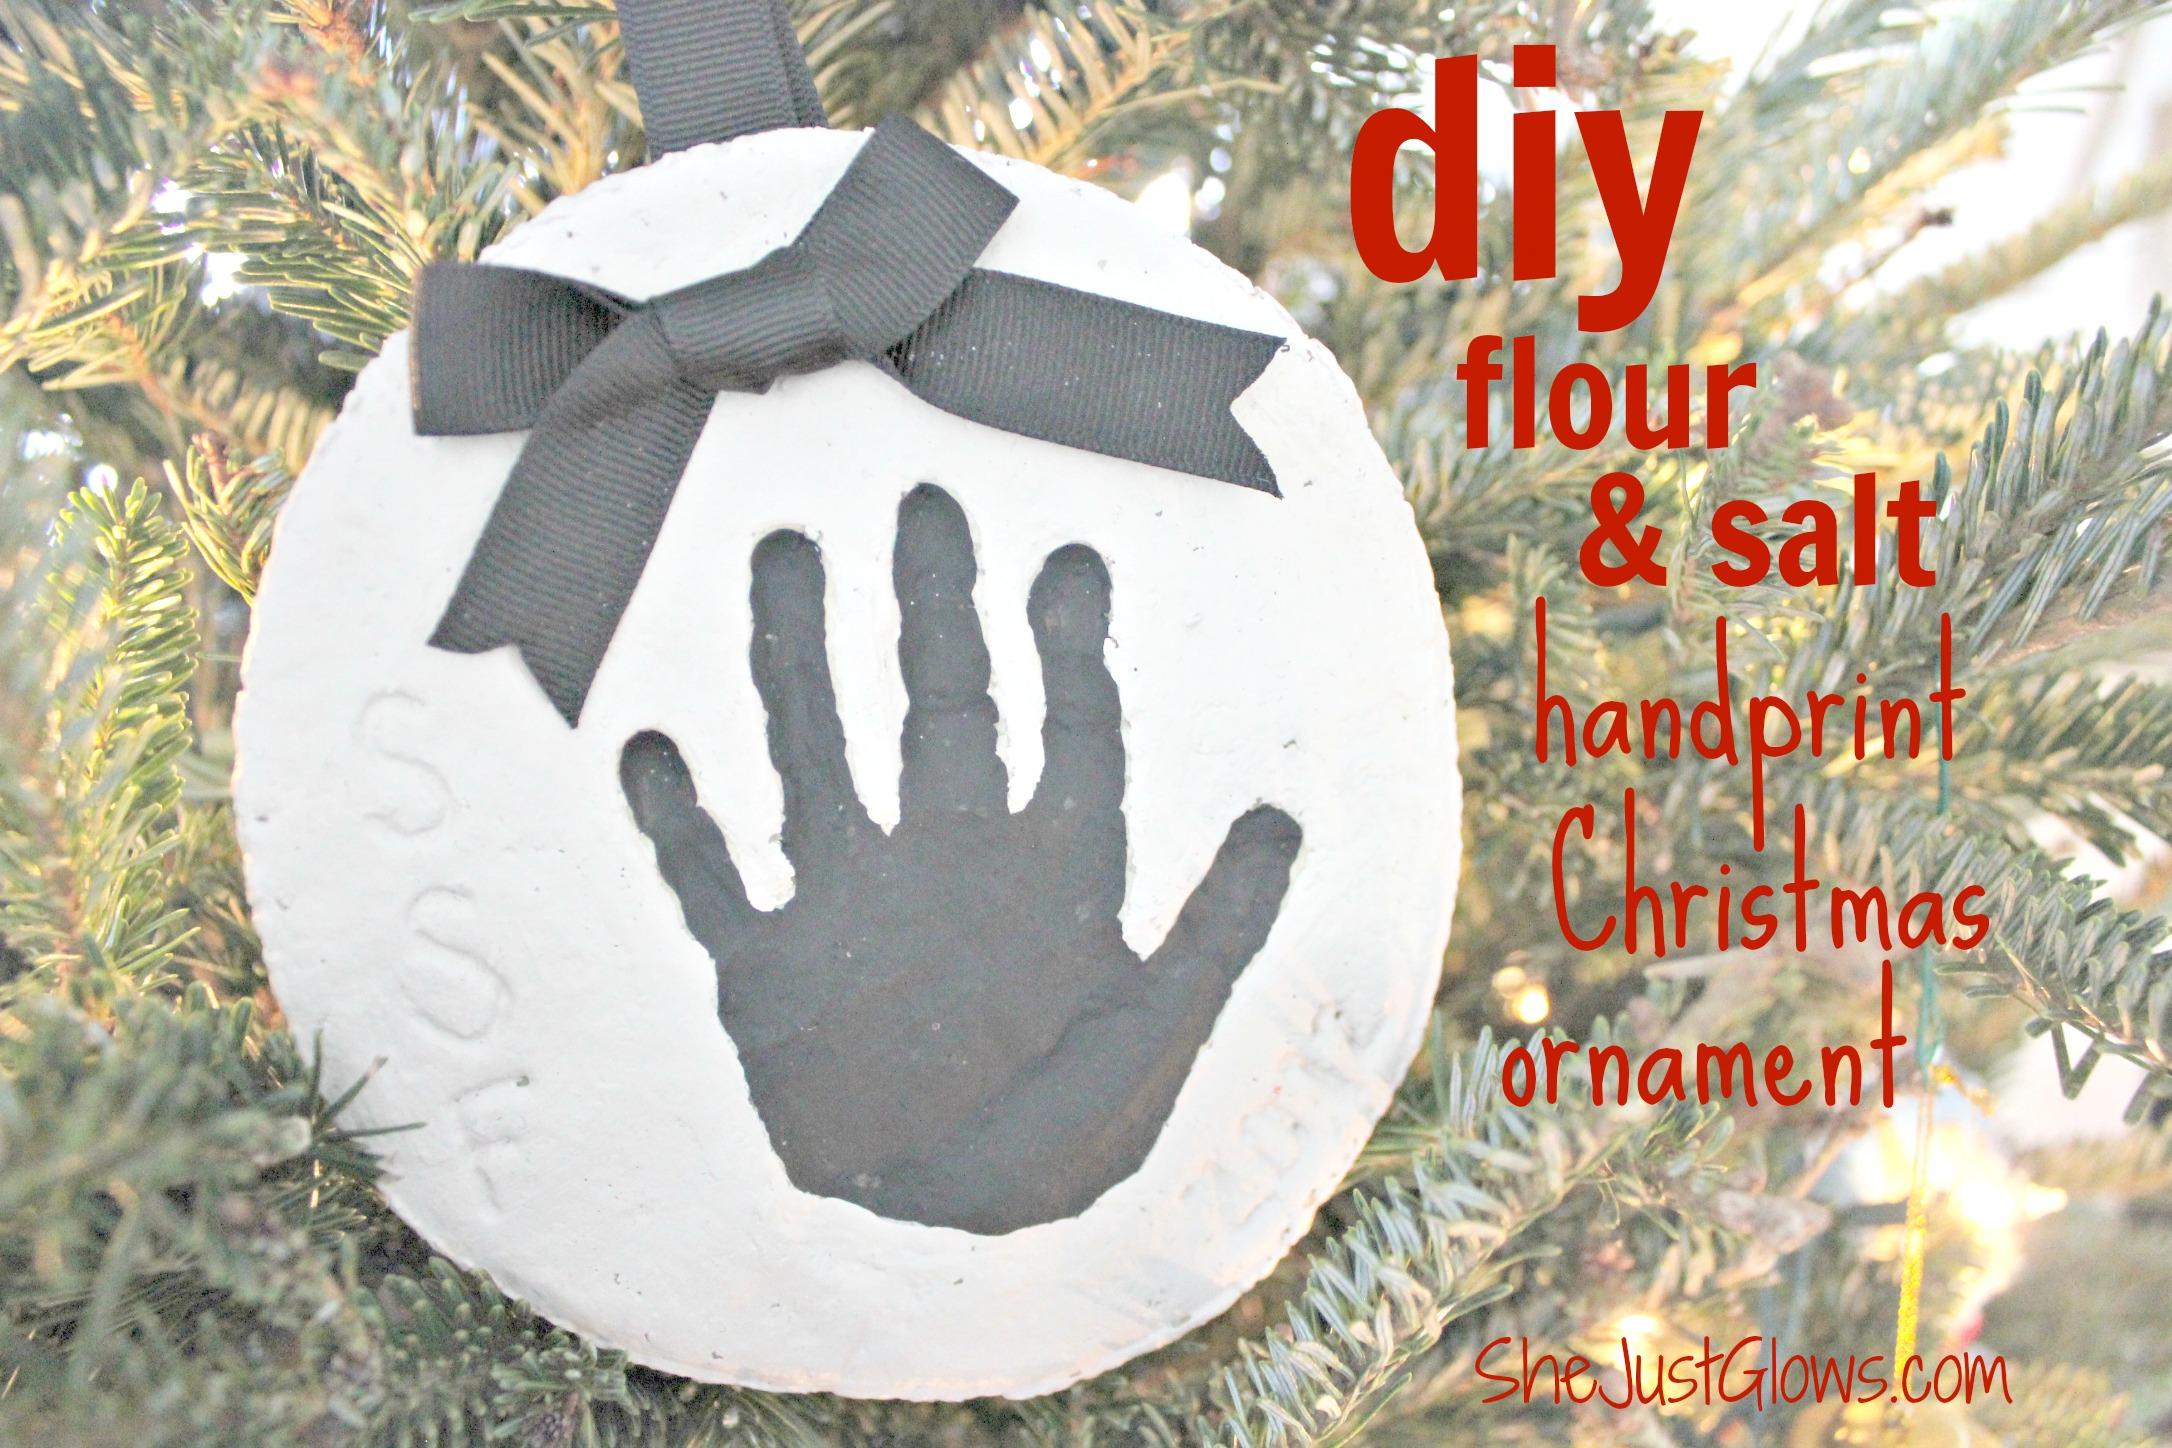 DIY Flour & Salt Handprint Christmas Ornament SheJustGlows.com